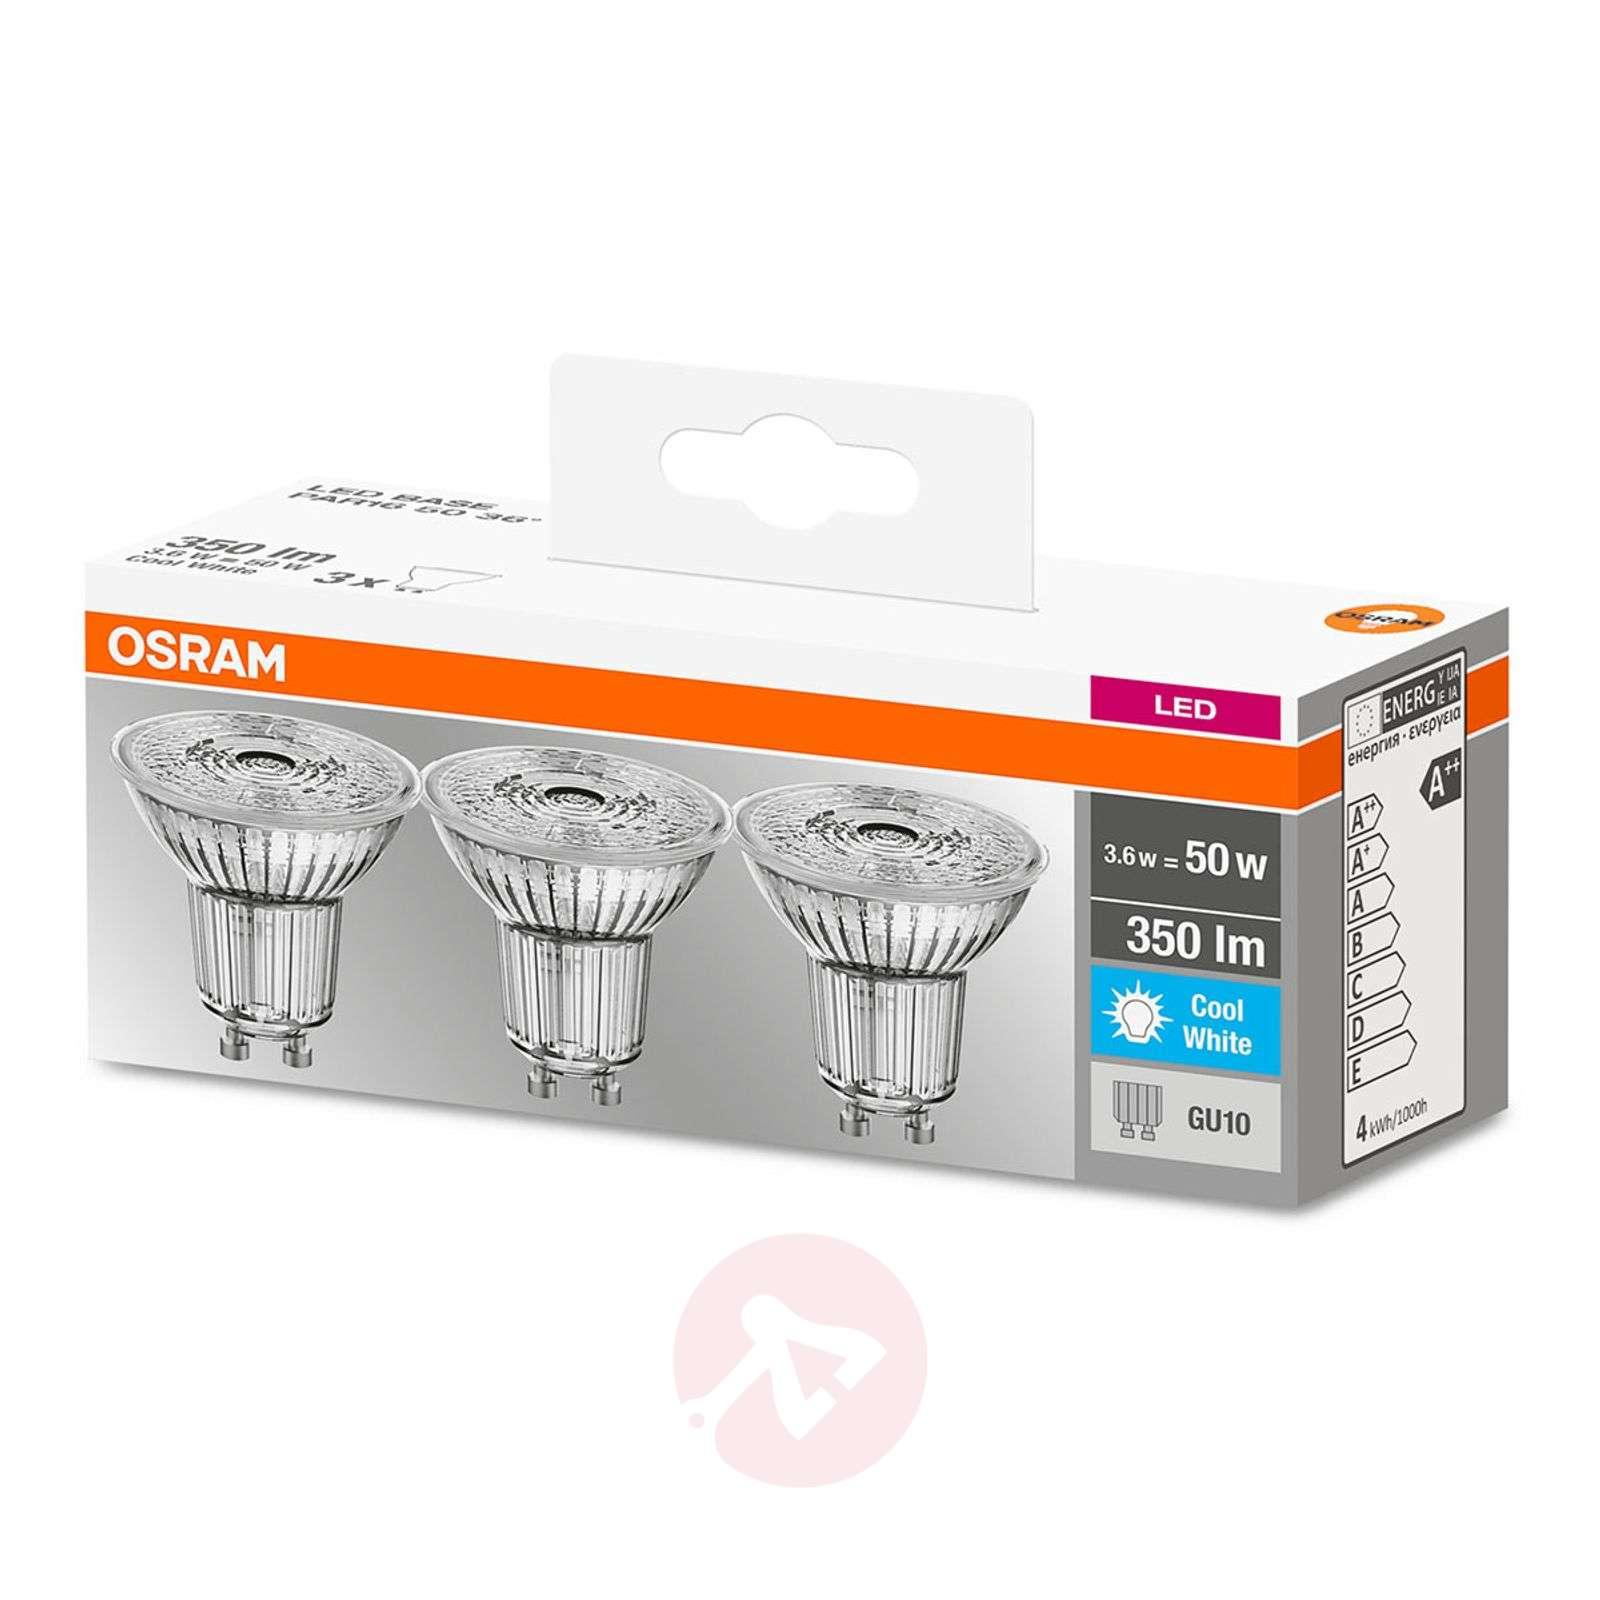 LED reflector bulb GU10 3,6W, cool white, set of 3-7262109-01